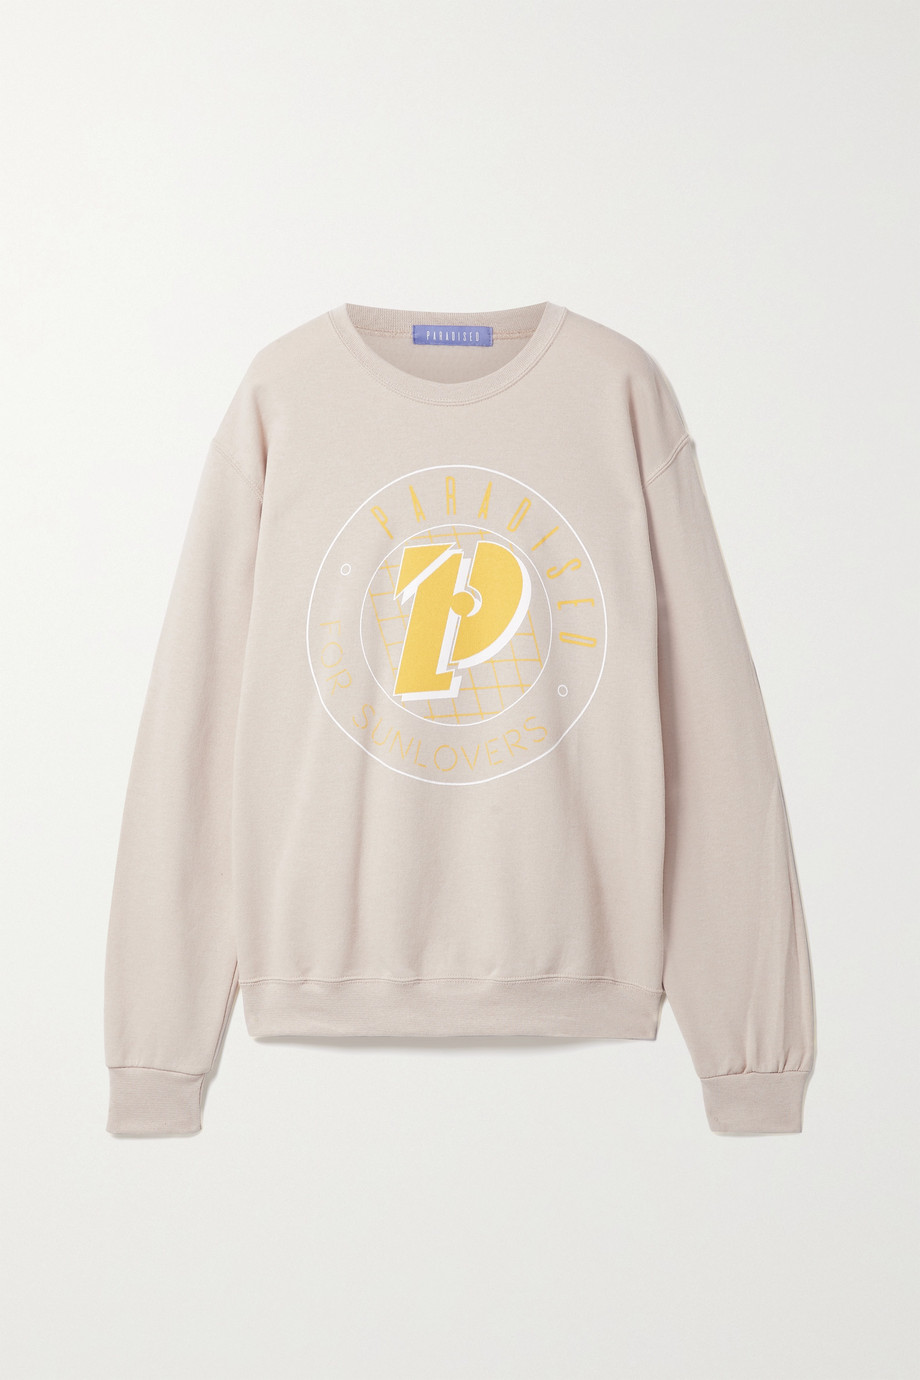 Paradised + NET SUSTAIN printed cotton-blend jersey sweatshirt